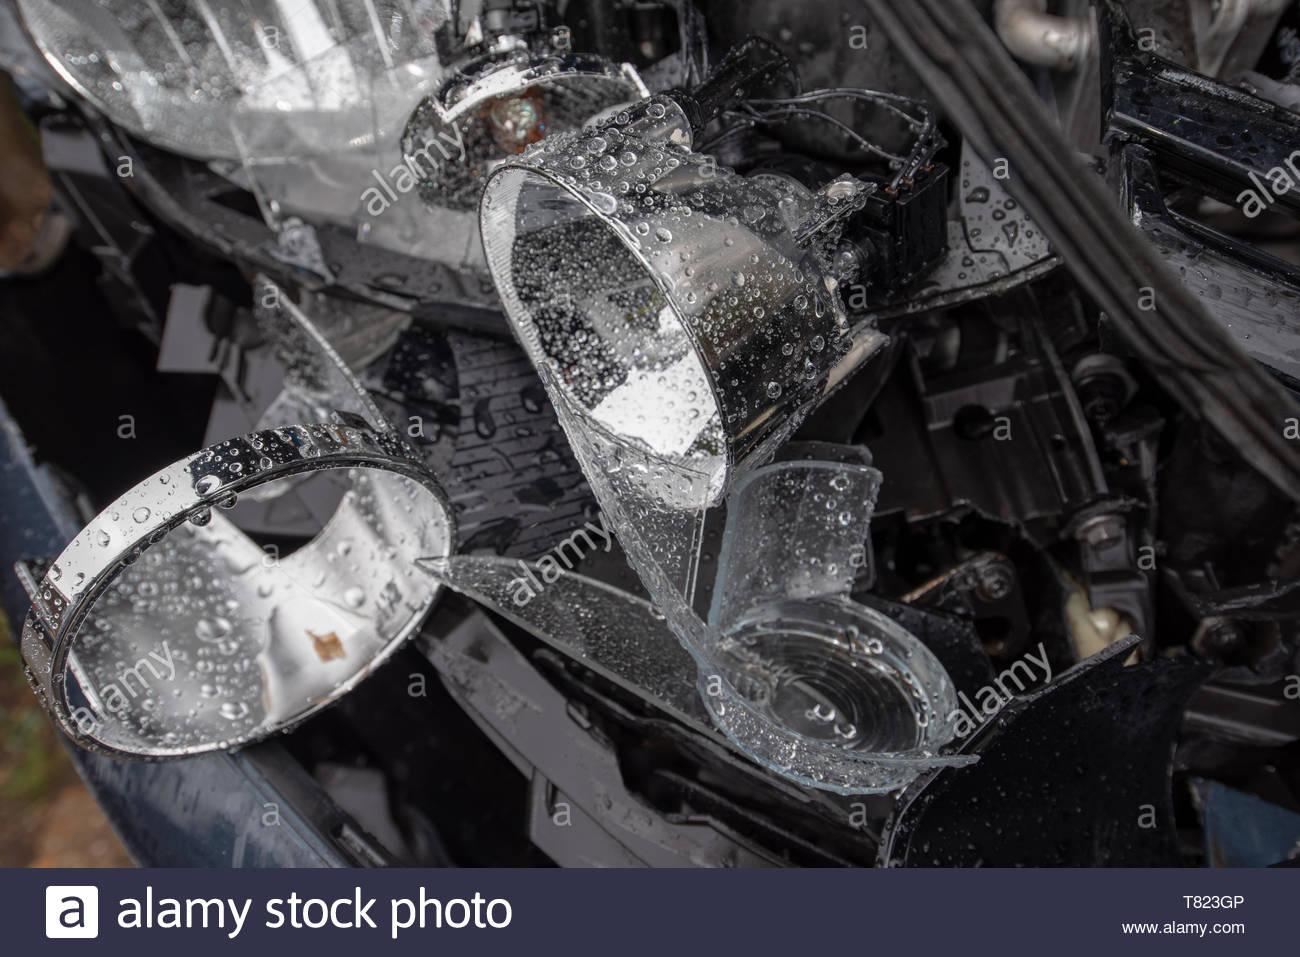 Volkswagen Golf Car crash damage and details Head on vehicle 1300x957